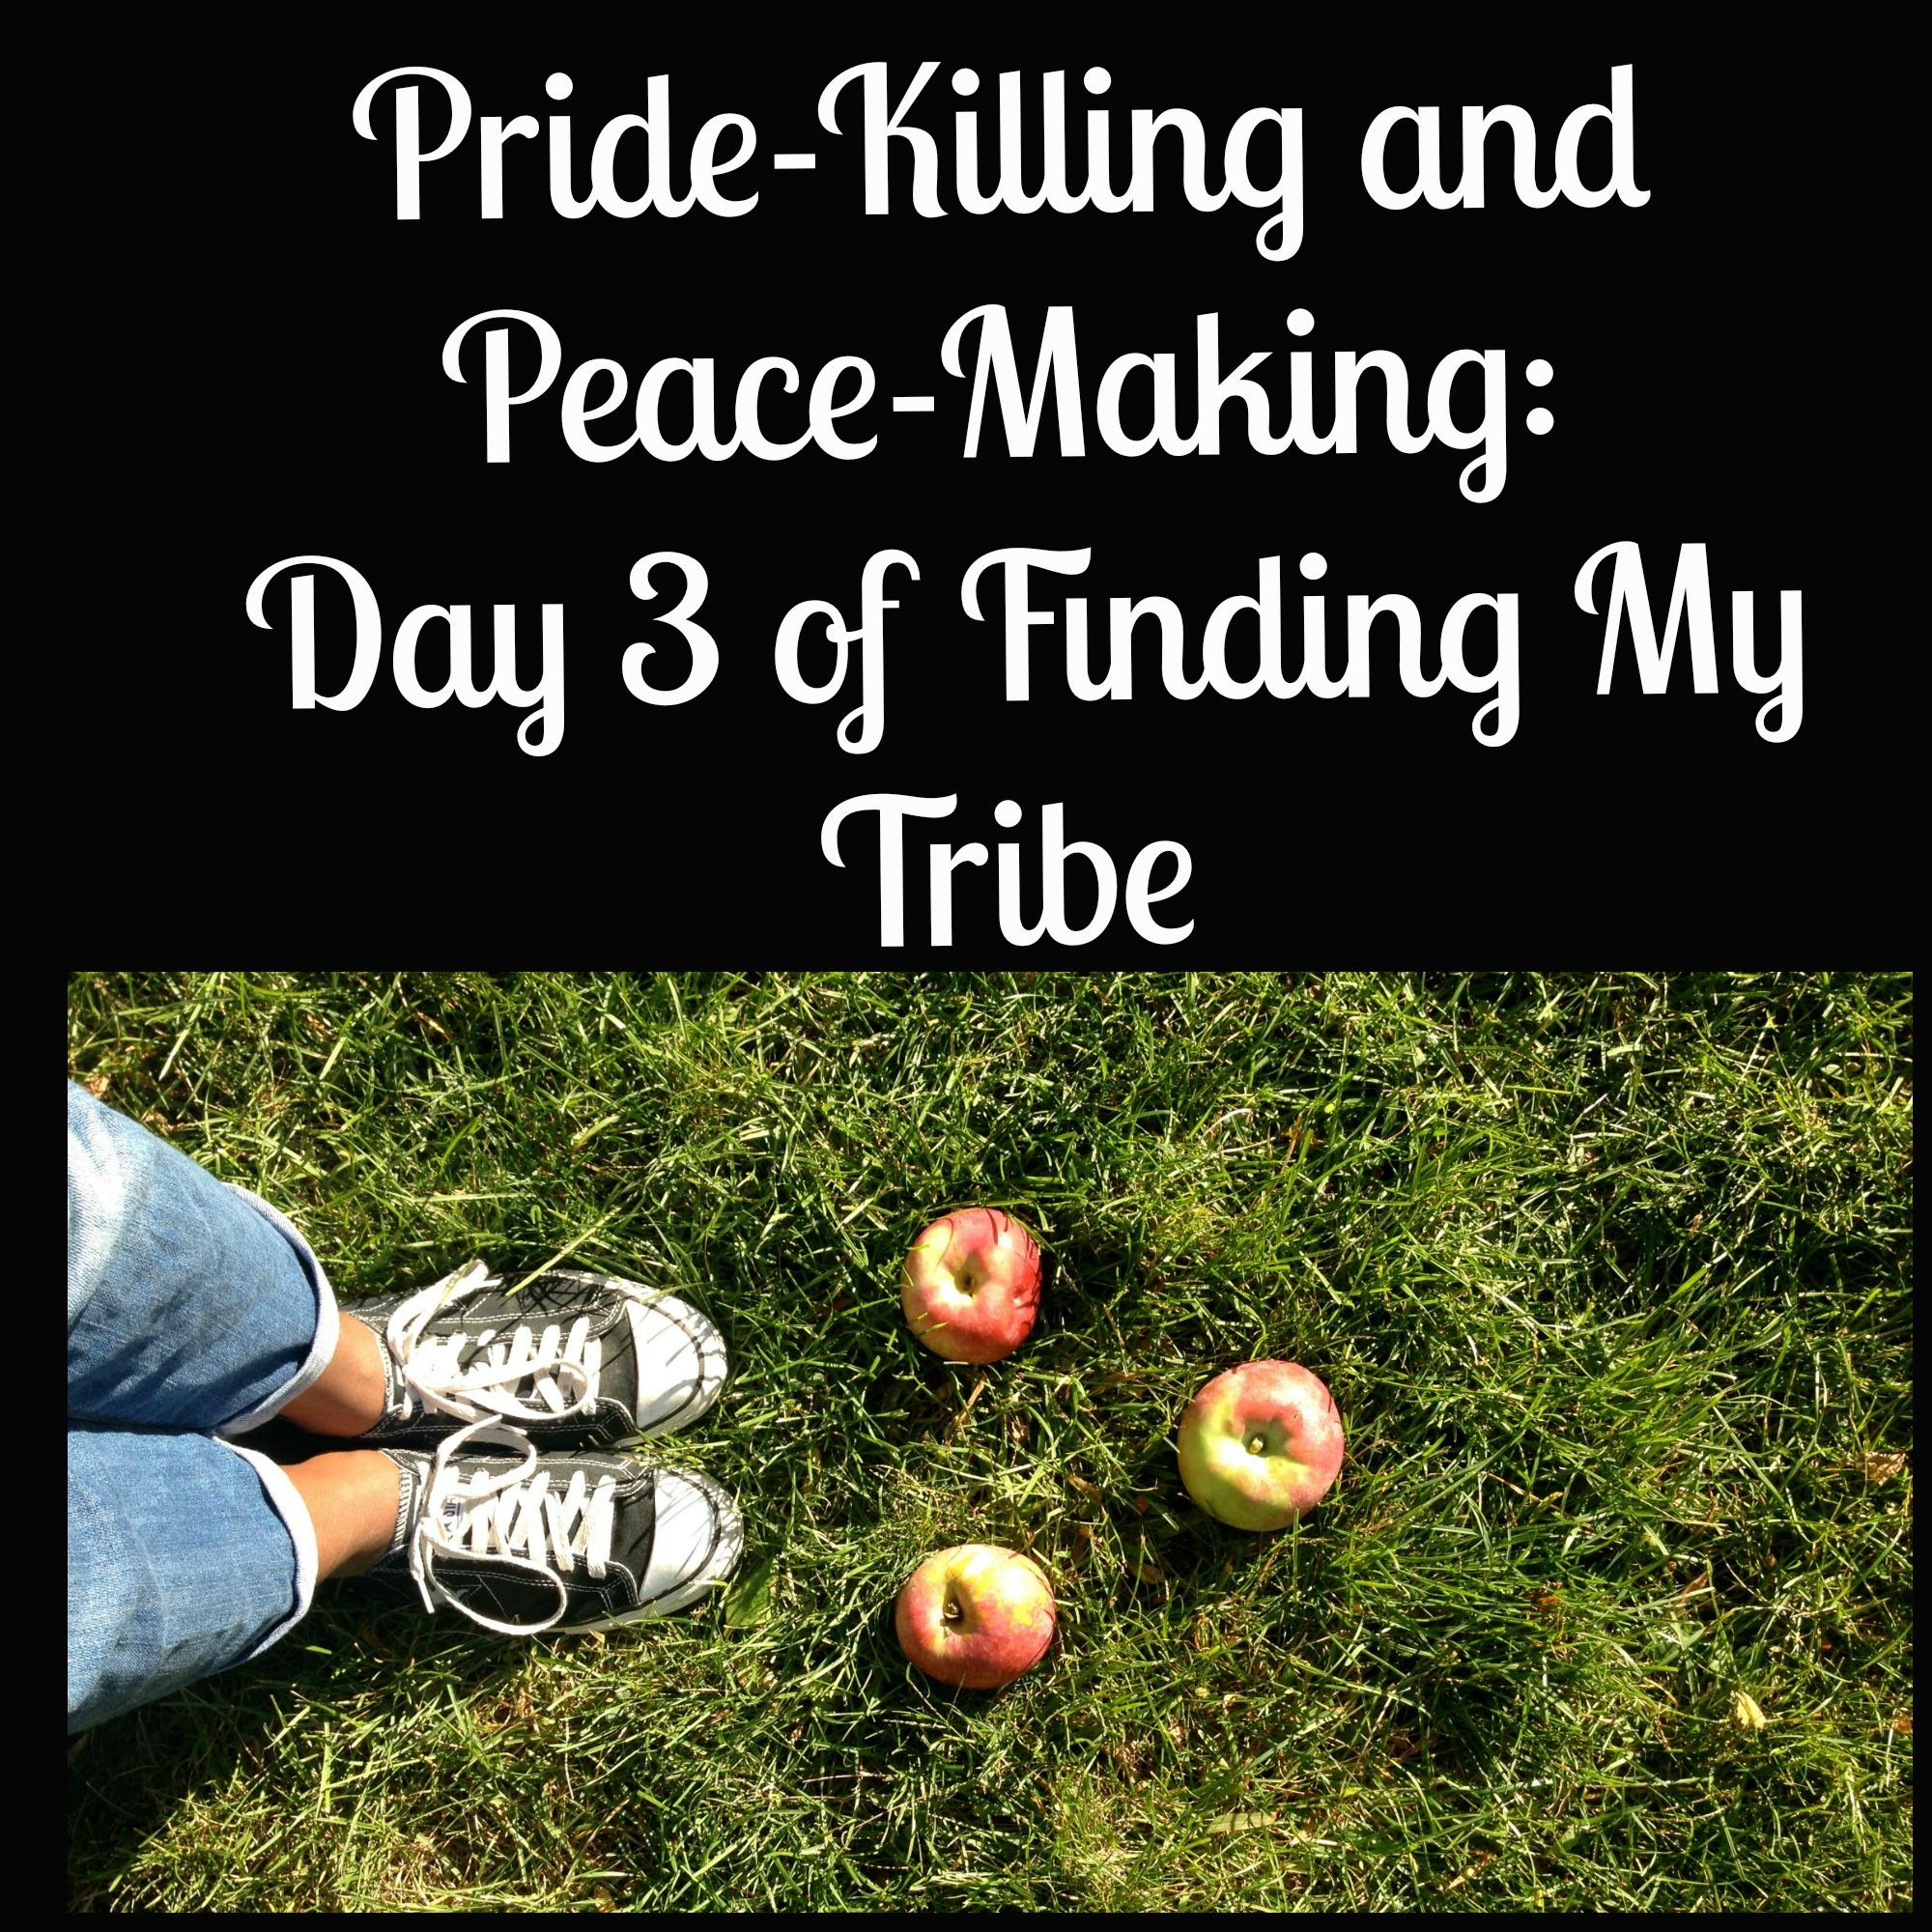 Day3TribeFindingblog